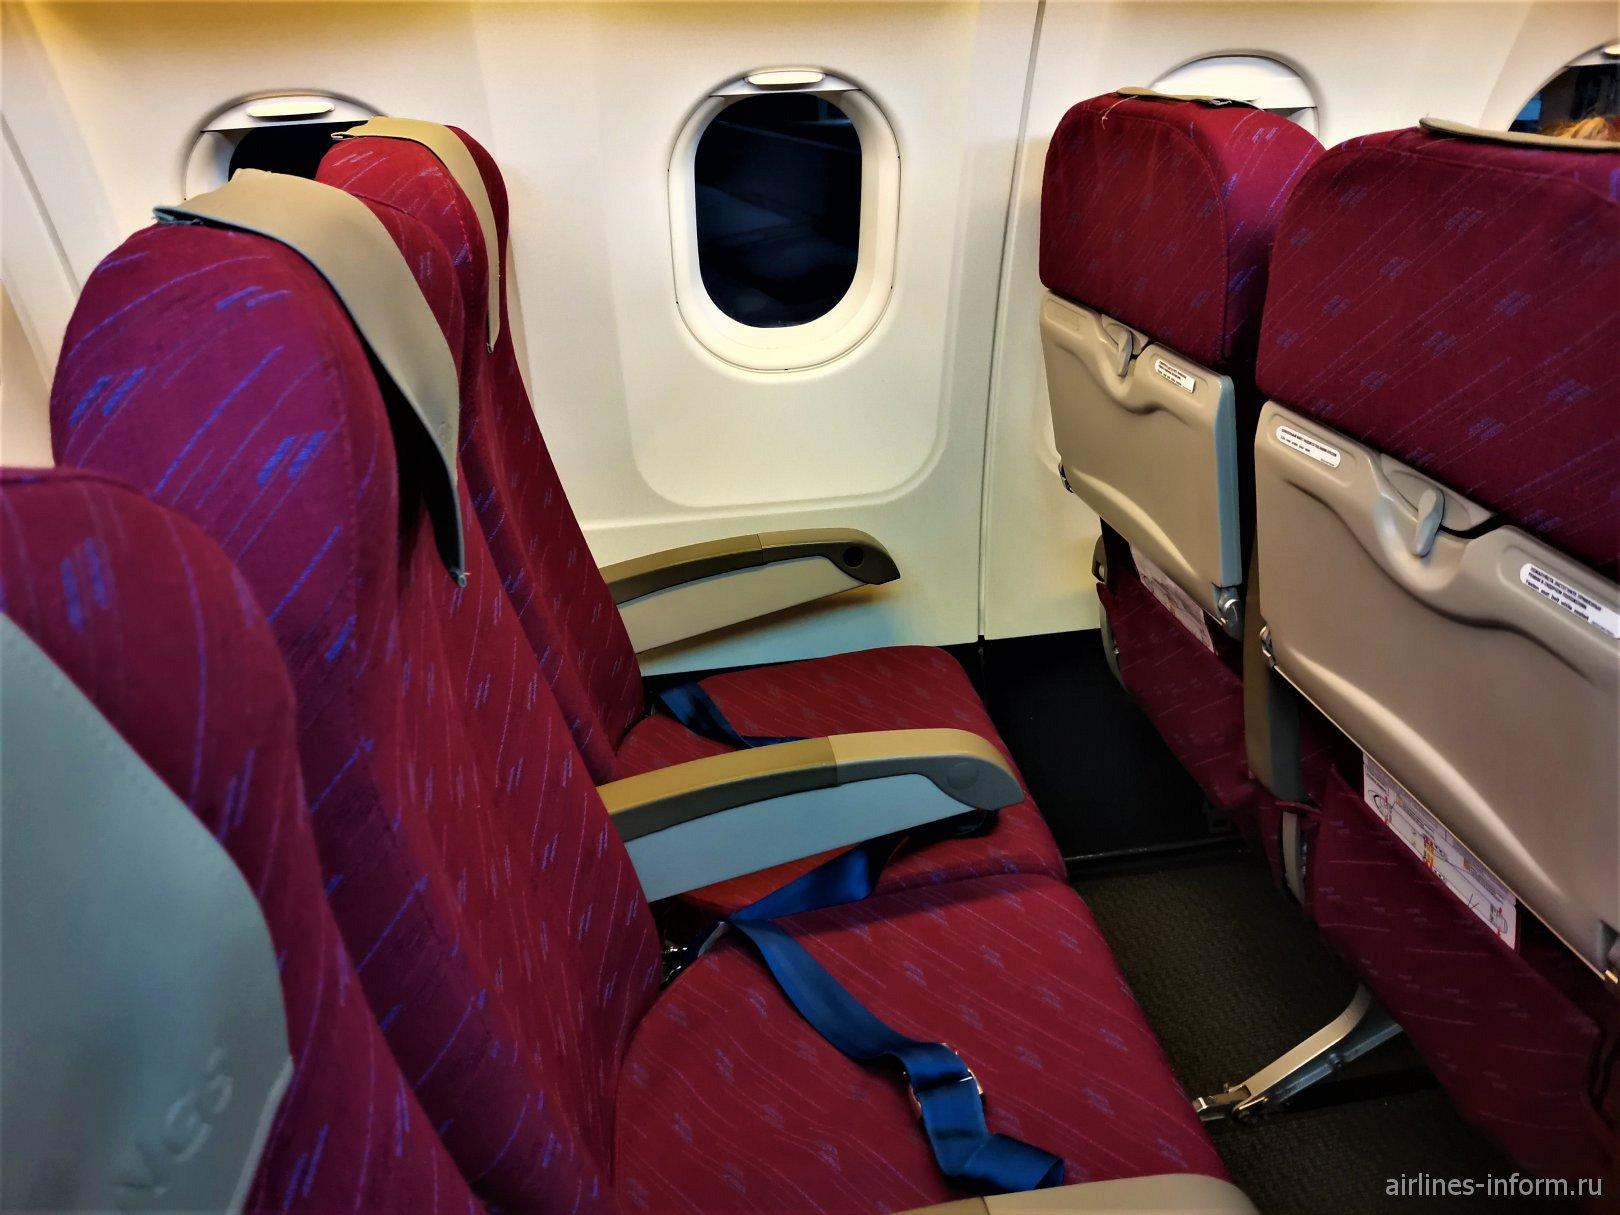 Пассажирские кресла в самолете Airbus A320 авиакомпании Red Wings